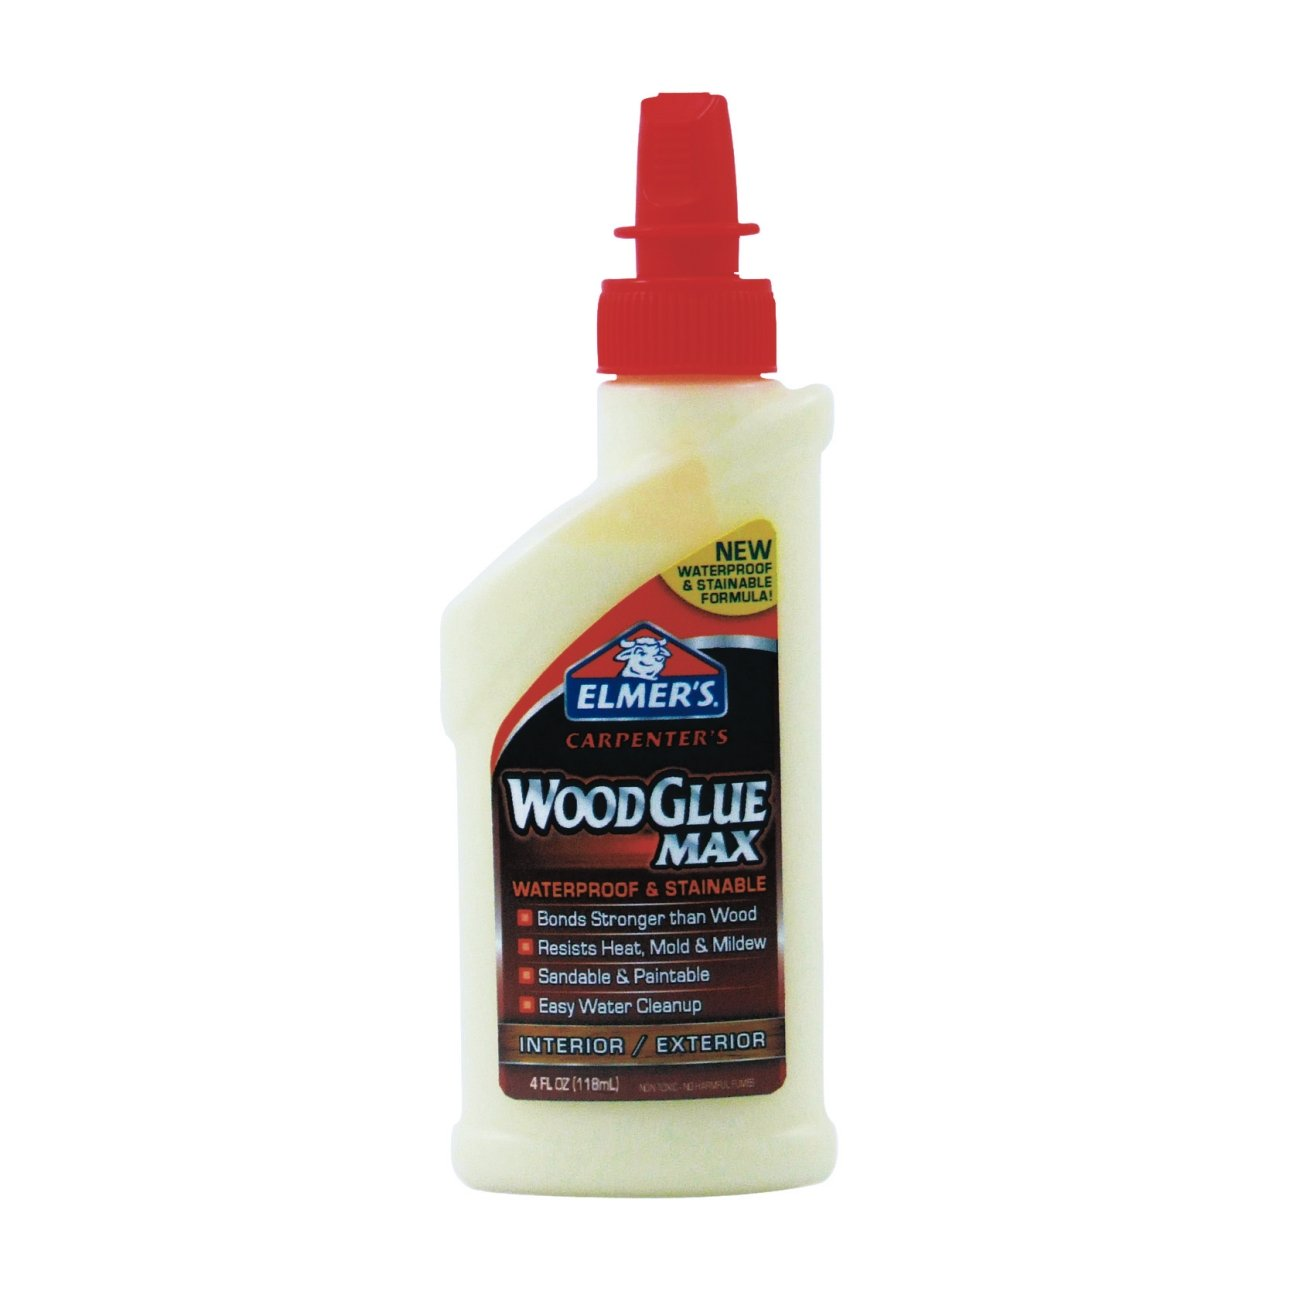 wood glue max elmer's